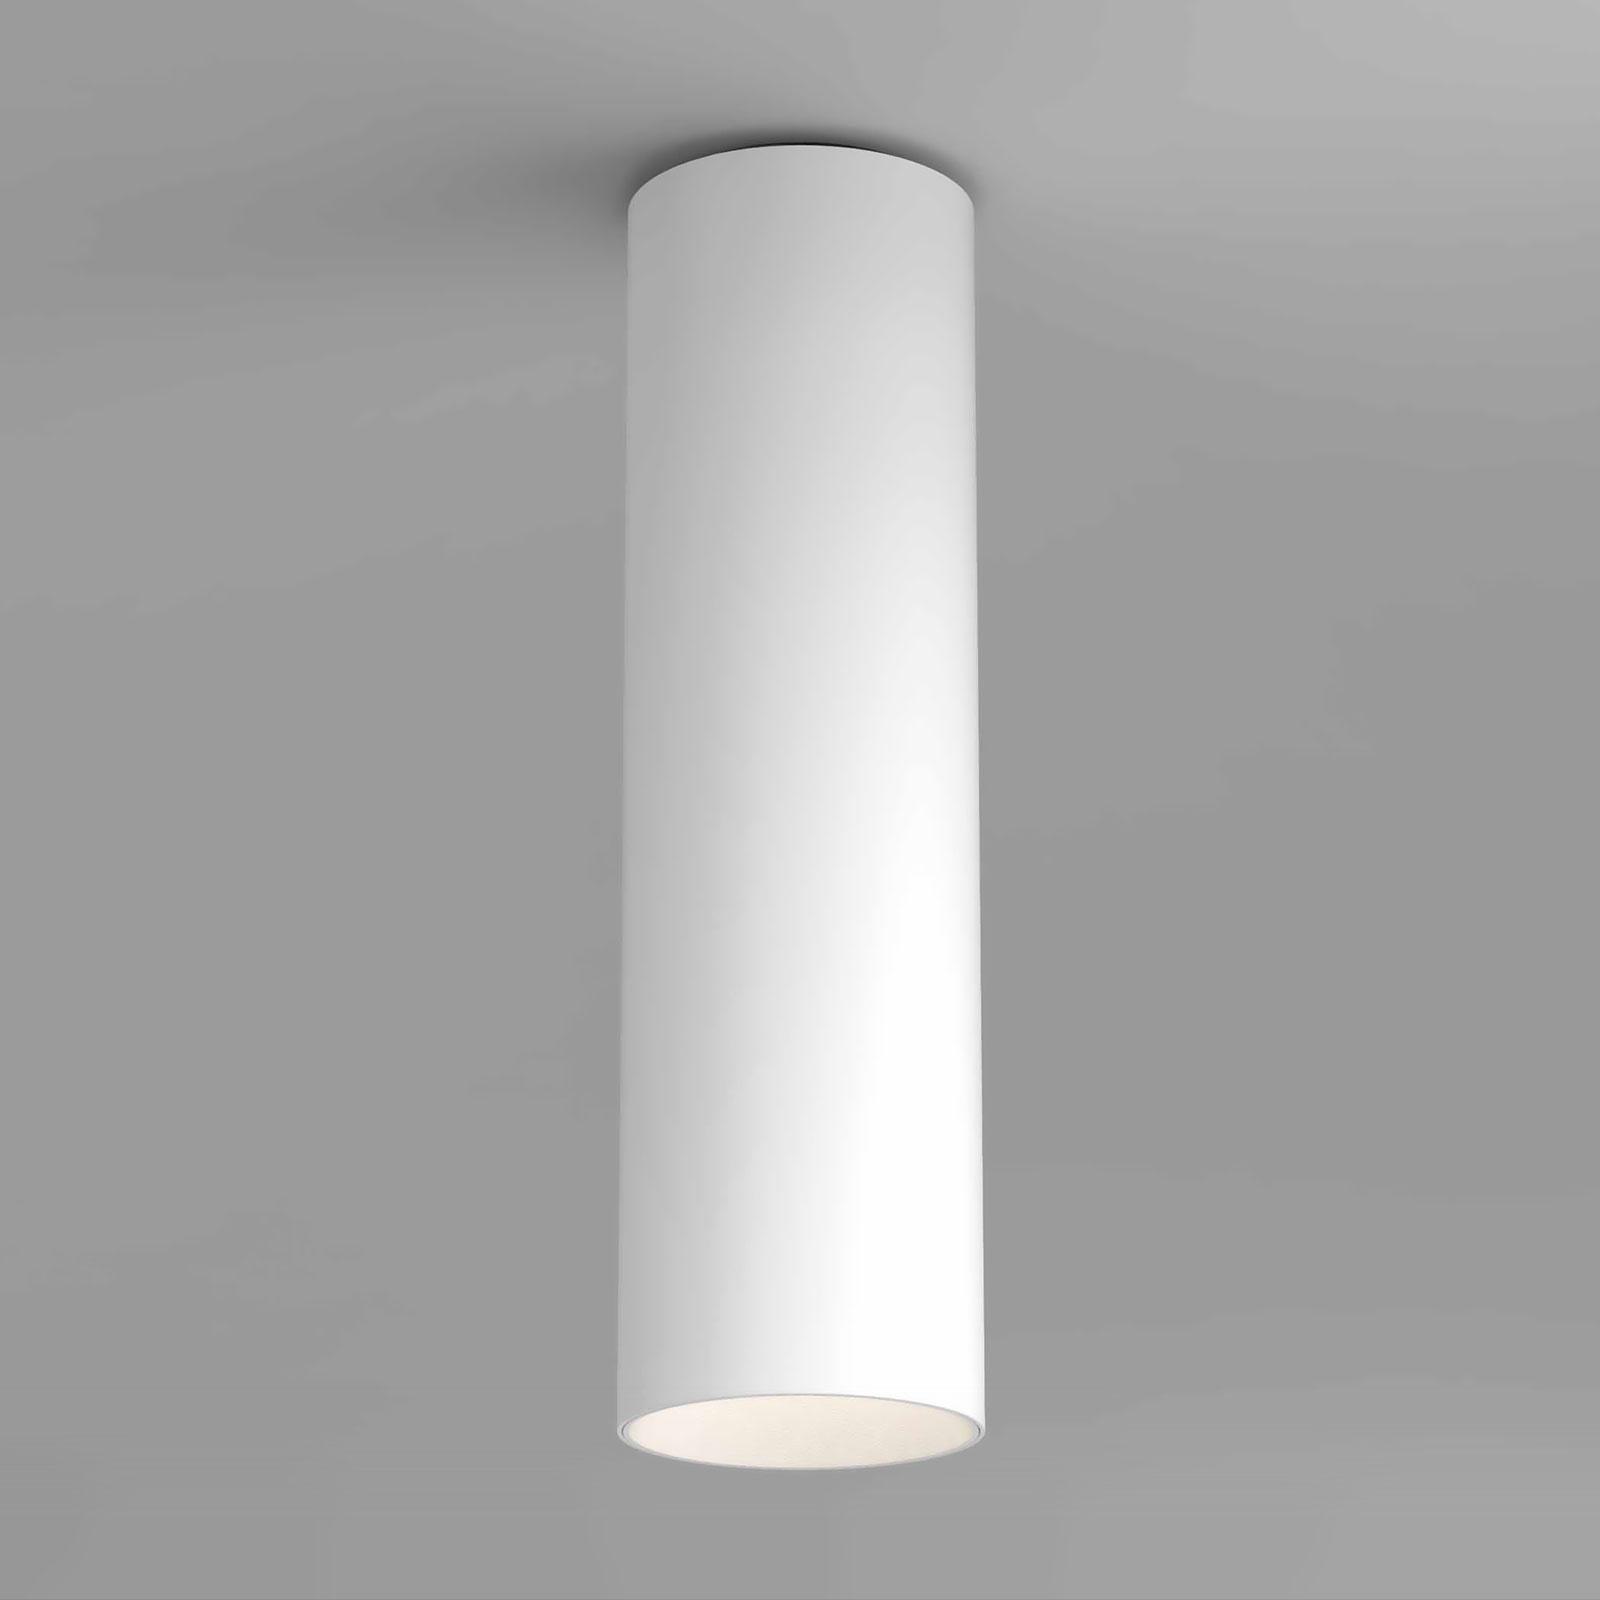 Astro Yuma Surface LED-loftlampe, mat hvid